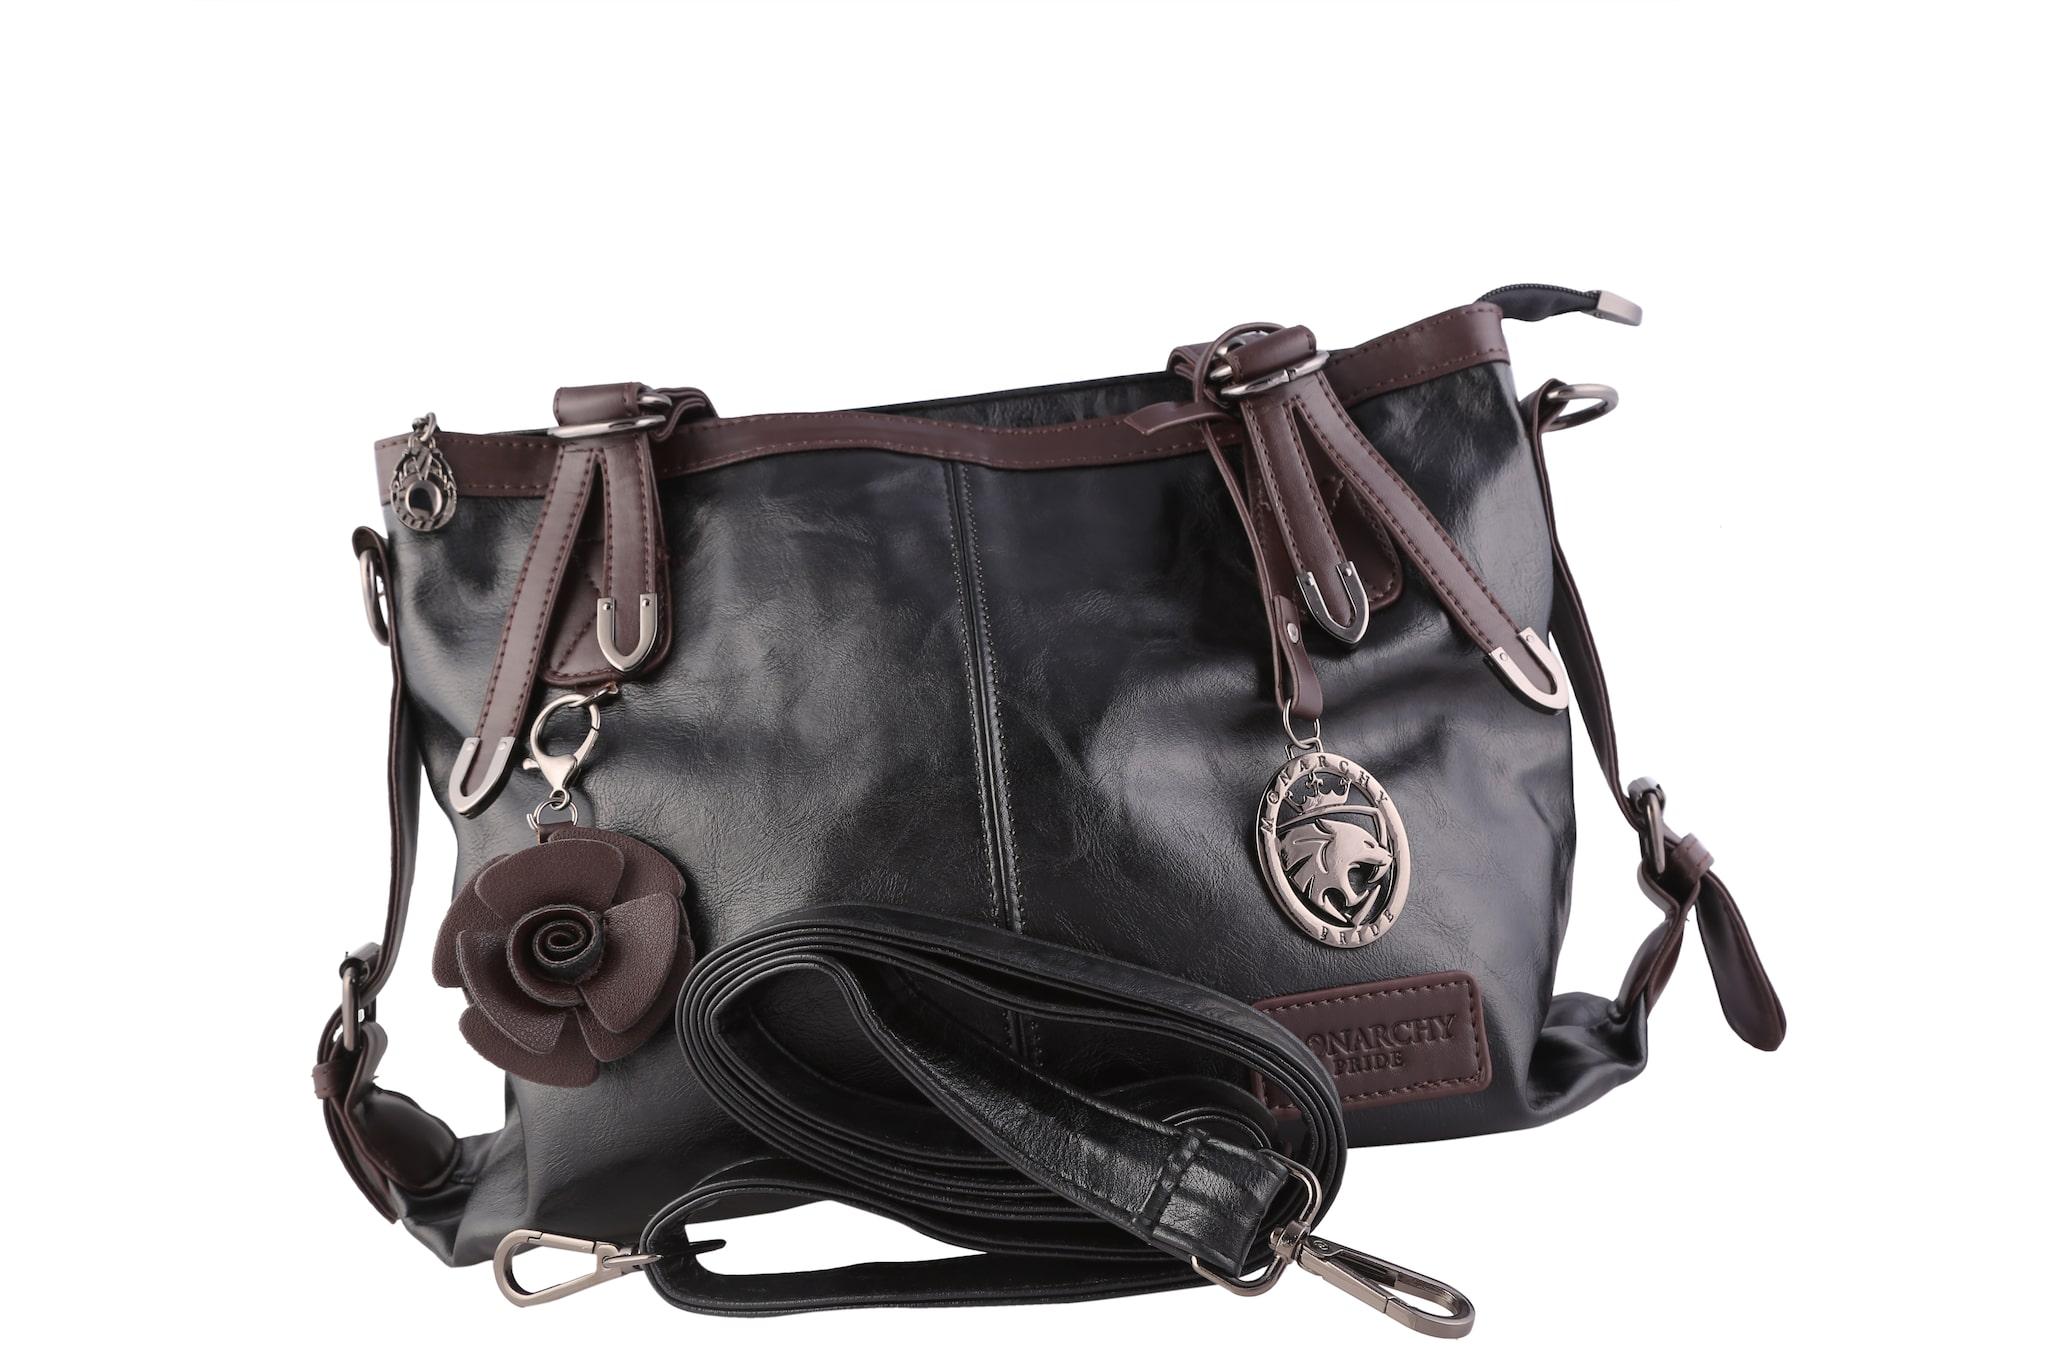 e6b79ee0ec19 Ladies Handbags - Handbags for Women Online - Designer Shoulder Bags at  Paytm Mall